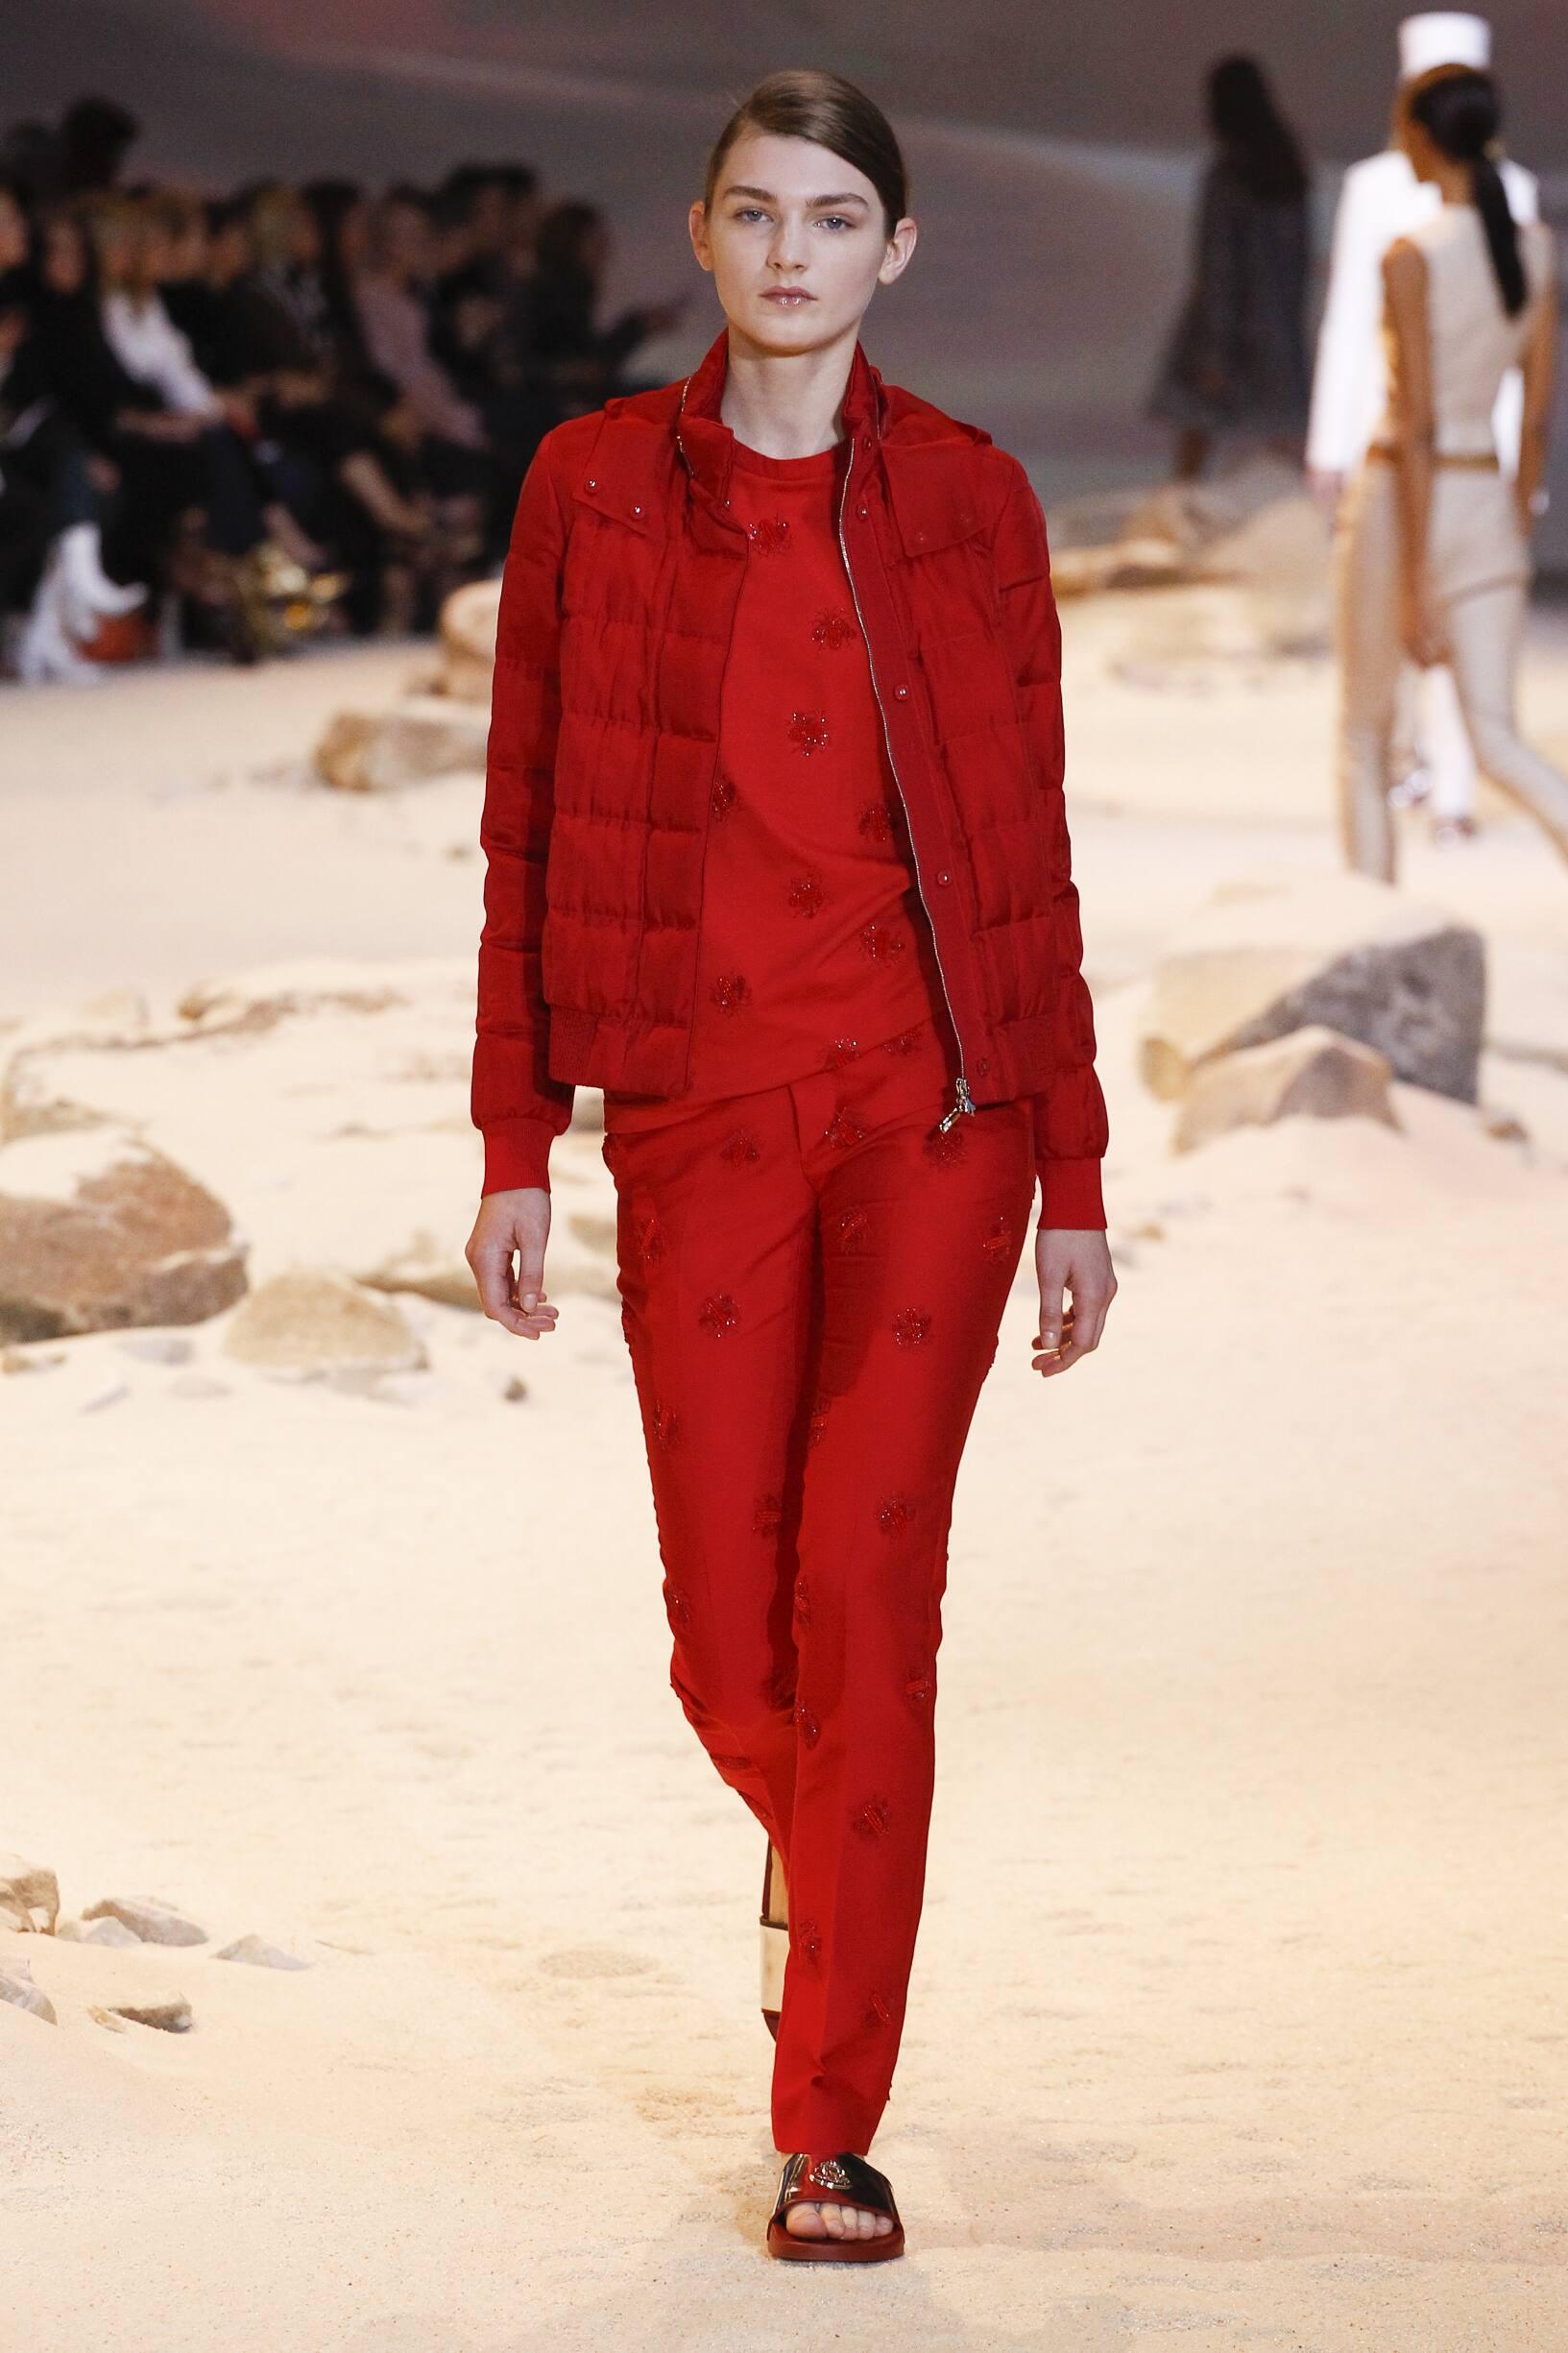 Spring Fashion 2017 Moncler Gamme Rouge